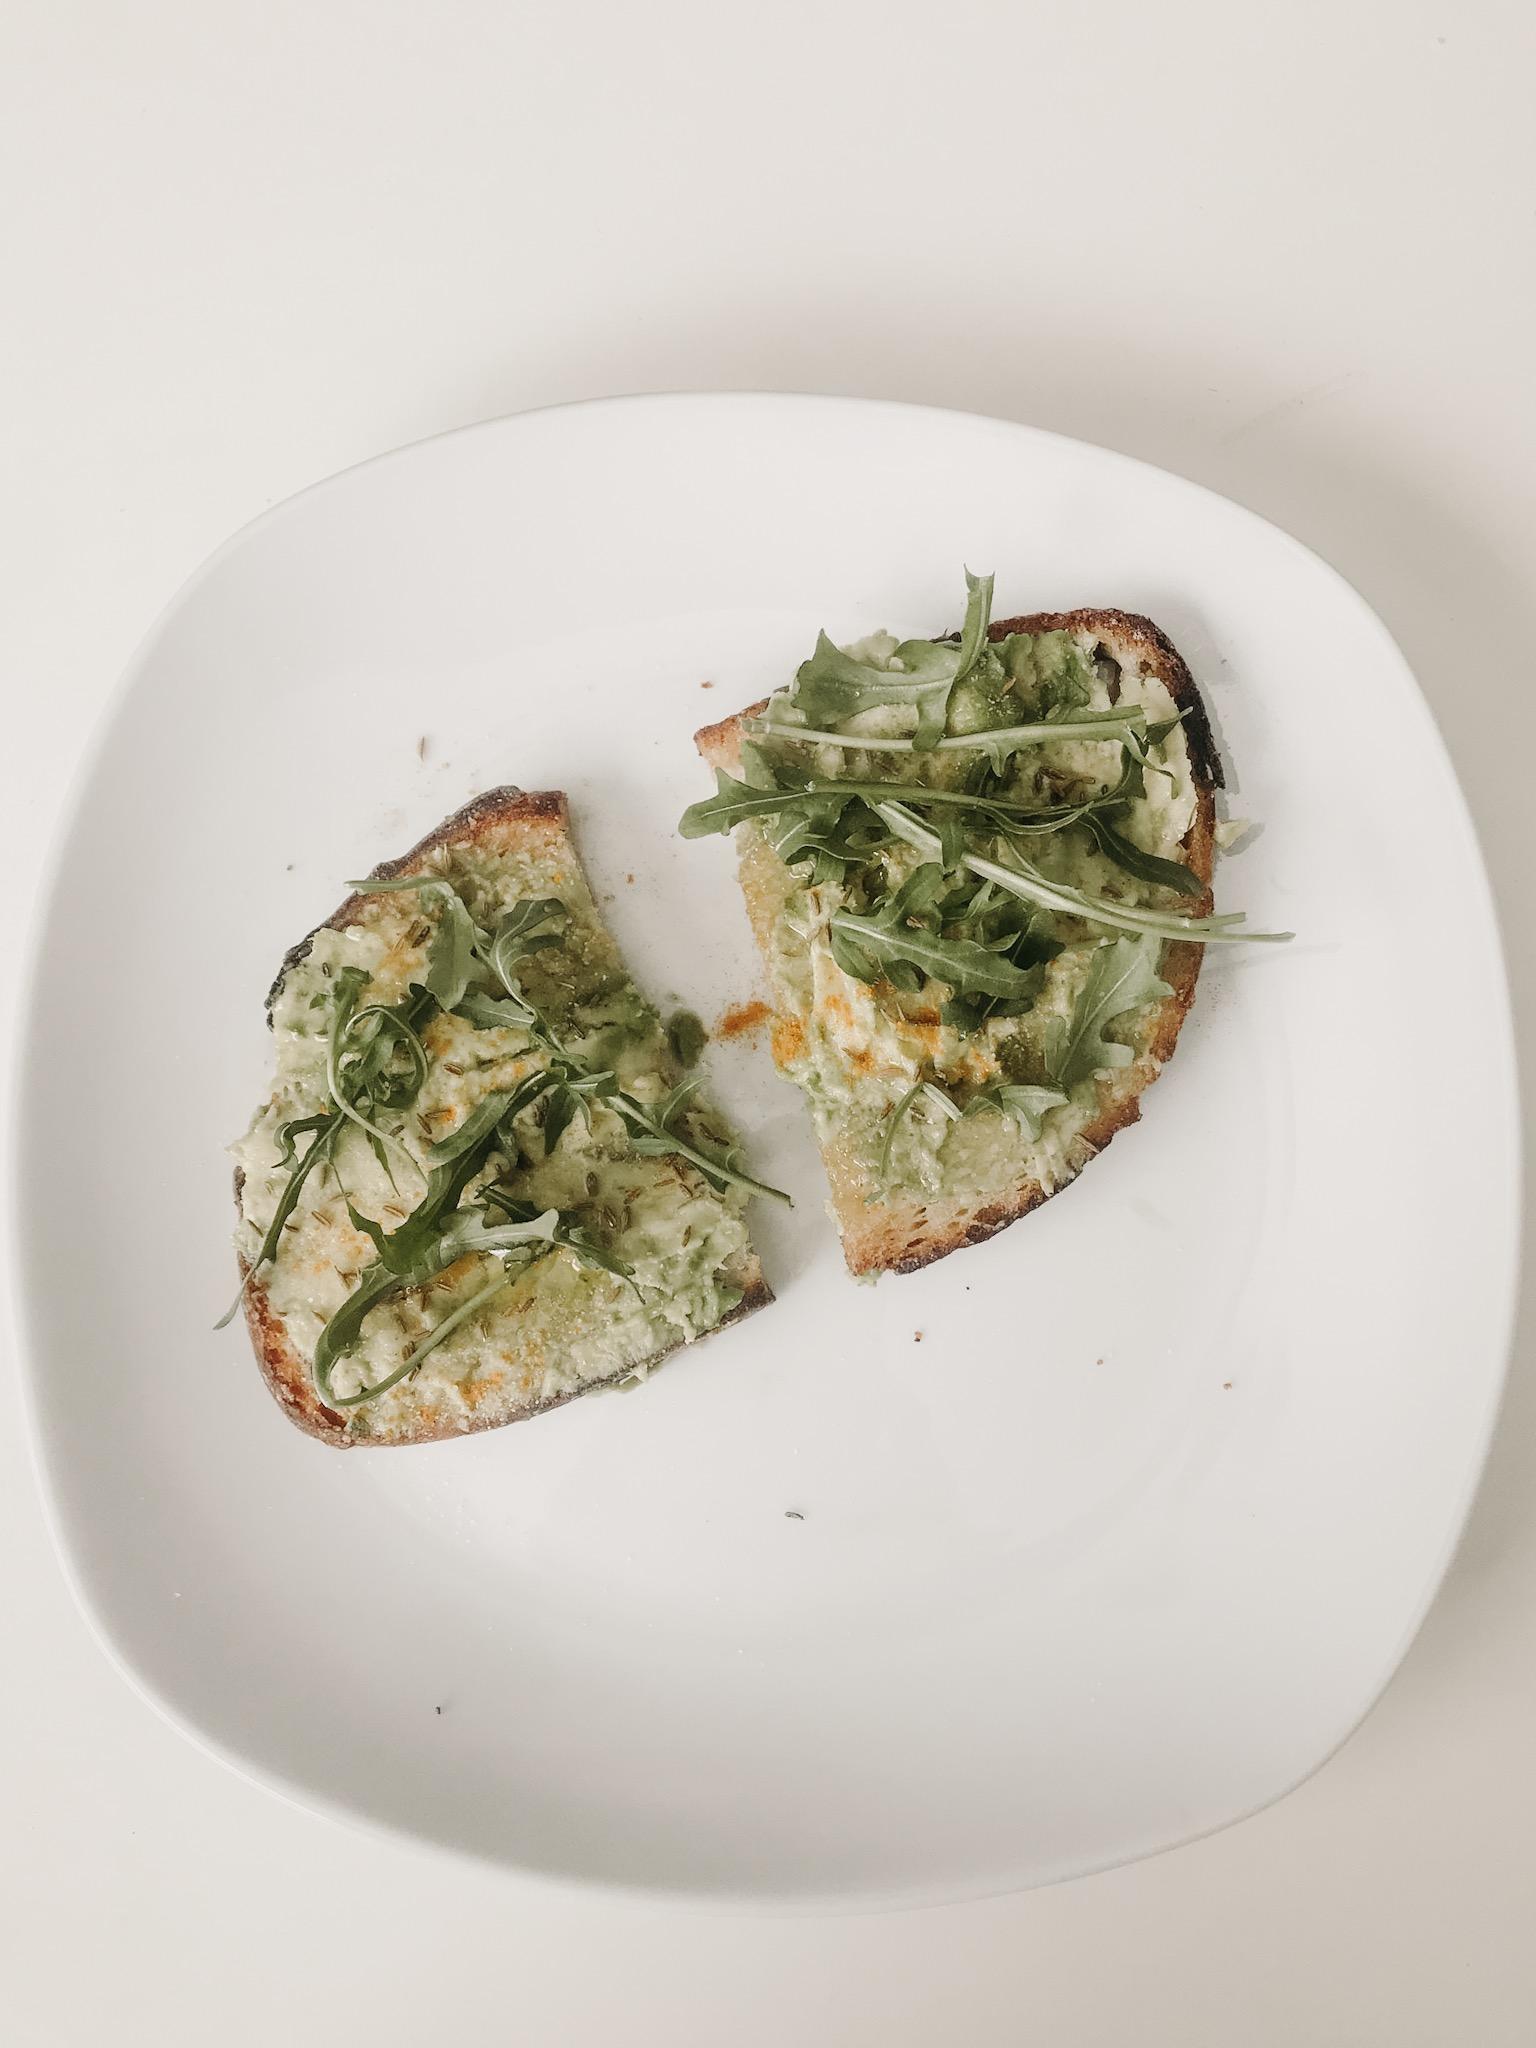 boujee avocado toast - + bread+ avocado+ arugula + salt and pepper+ cumin+ turmeric+ garlic powder